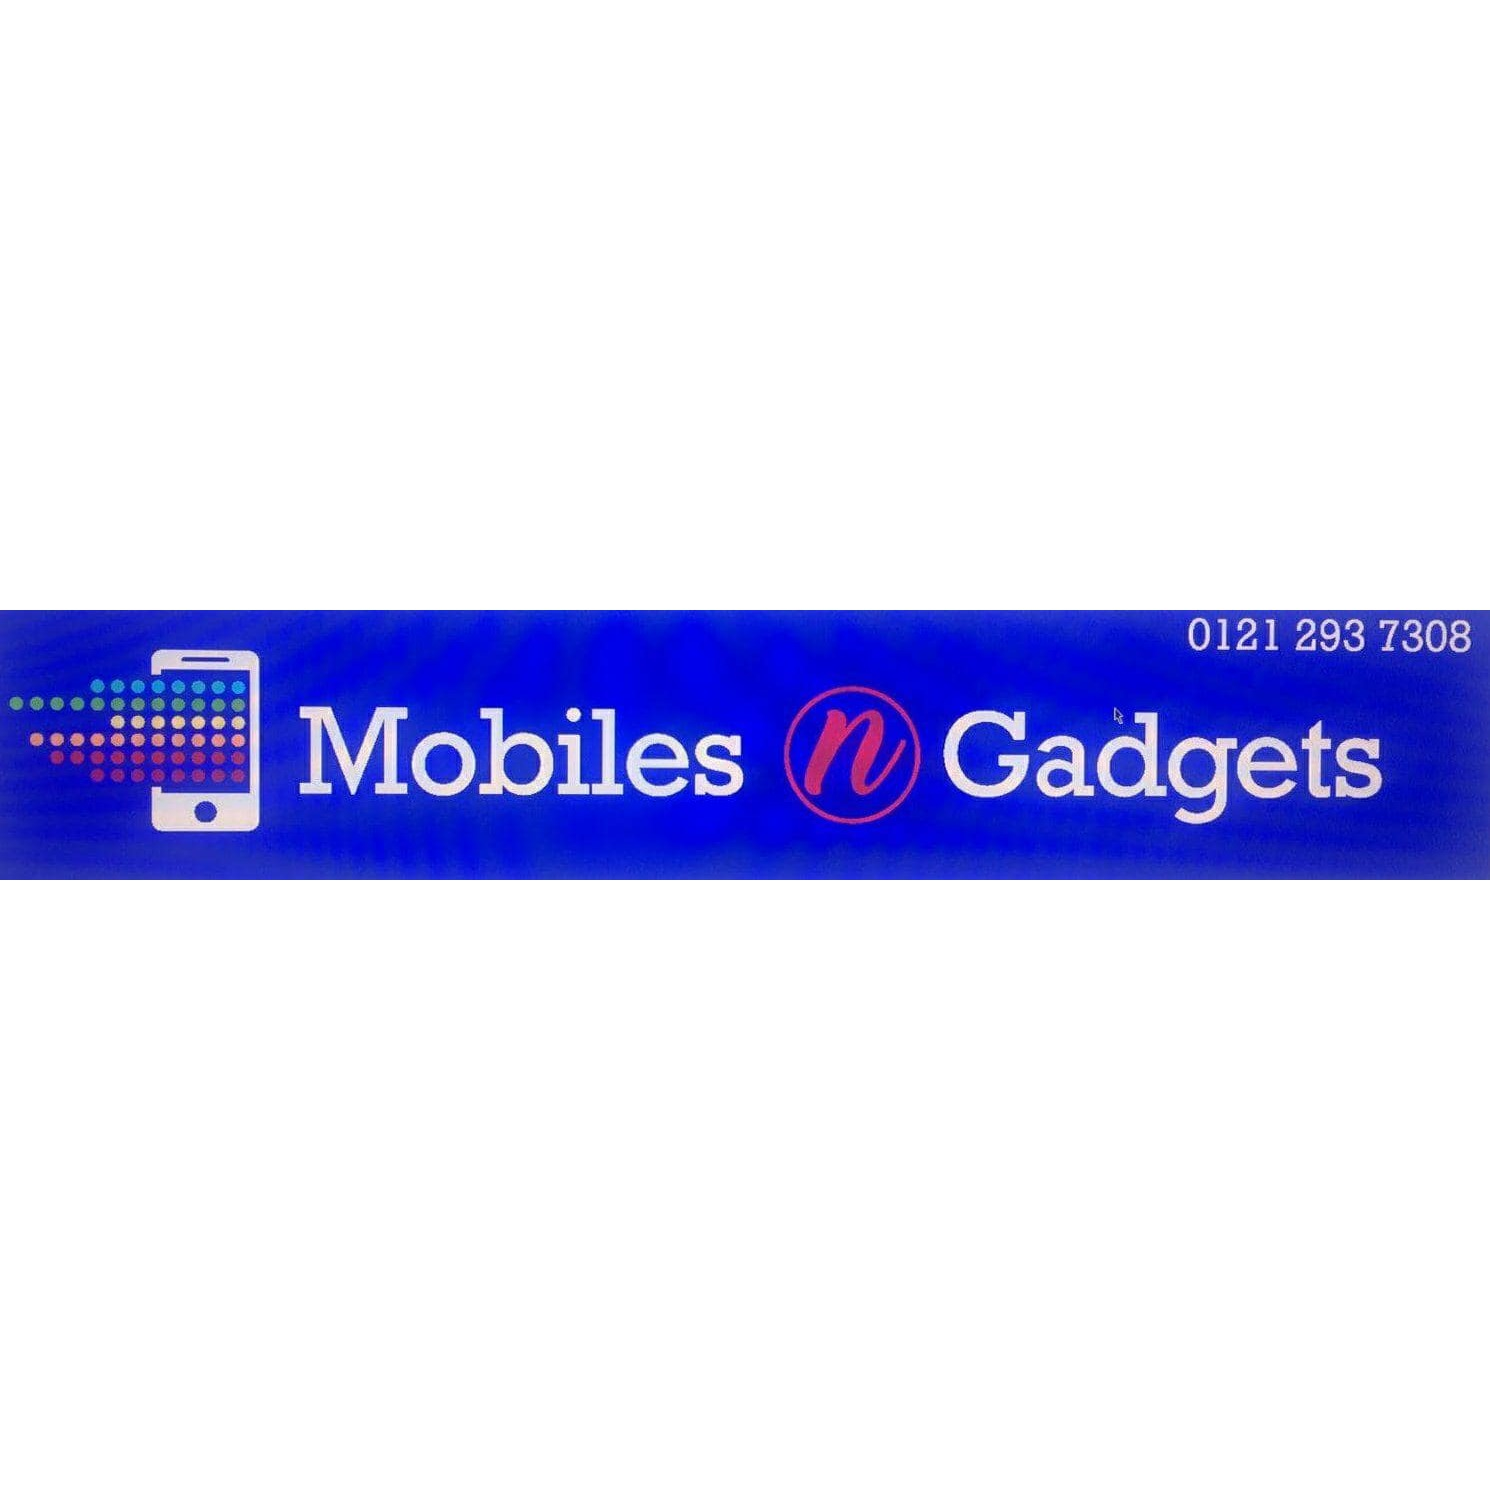 Mobiles n Gadgets - Birmingham, West Midlands B27 6BH - 01212 937308 | ShowMeLocal.com